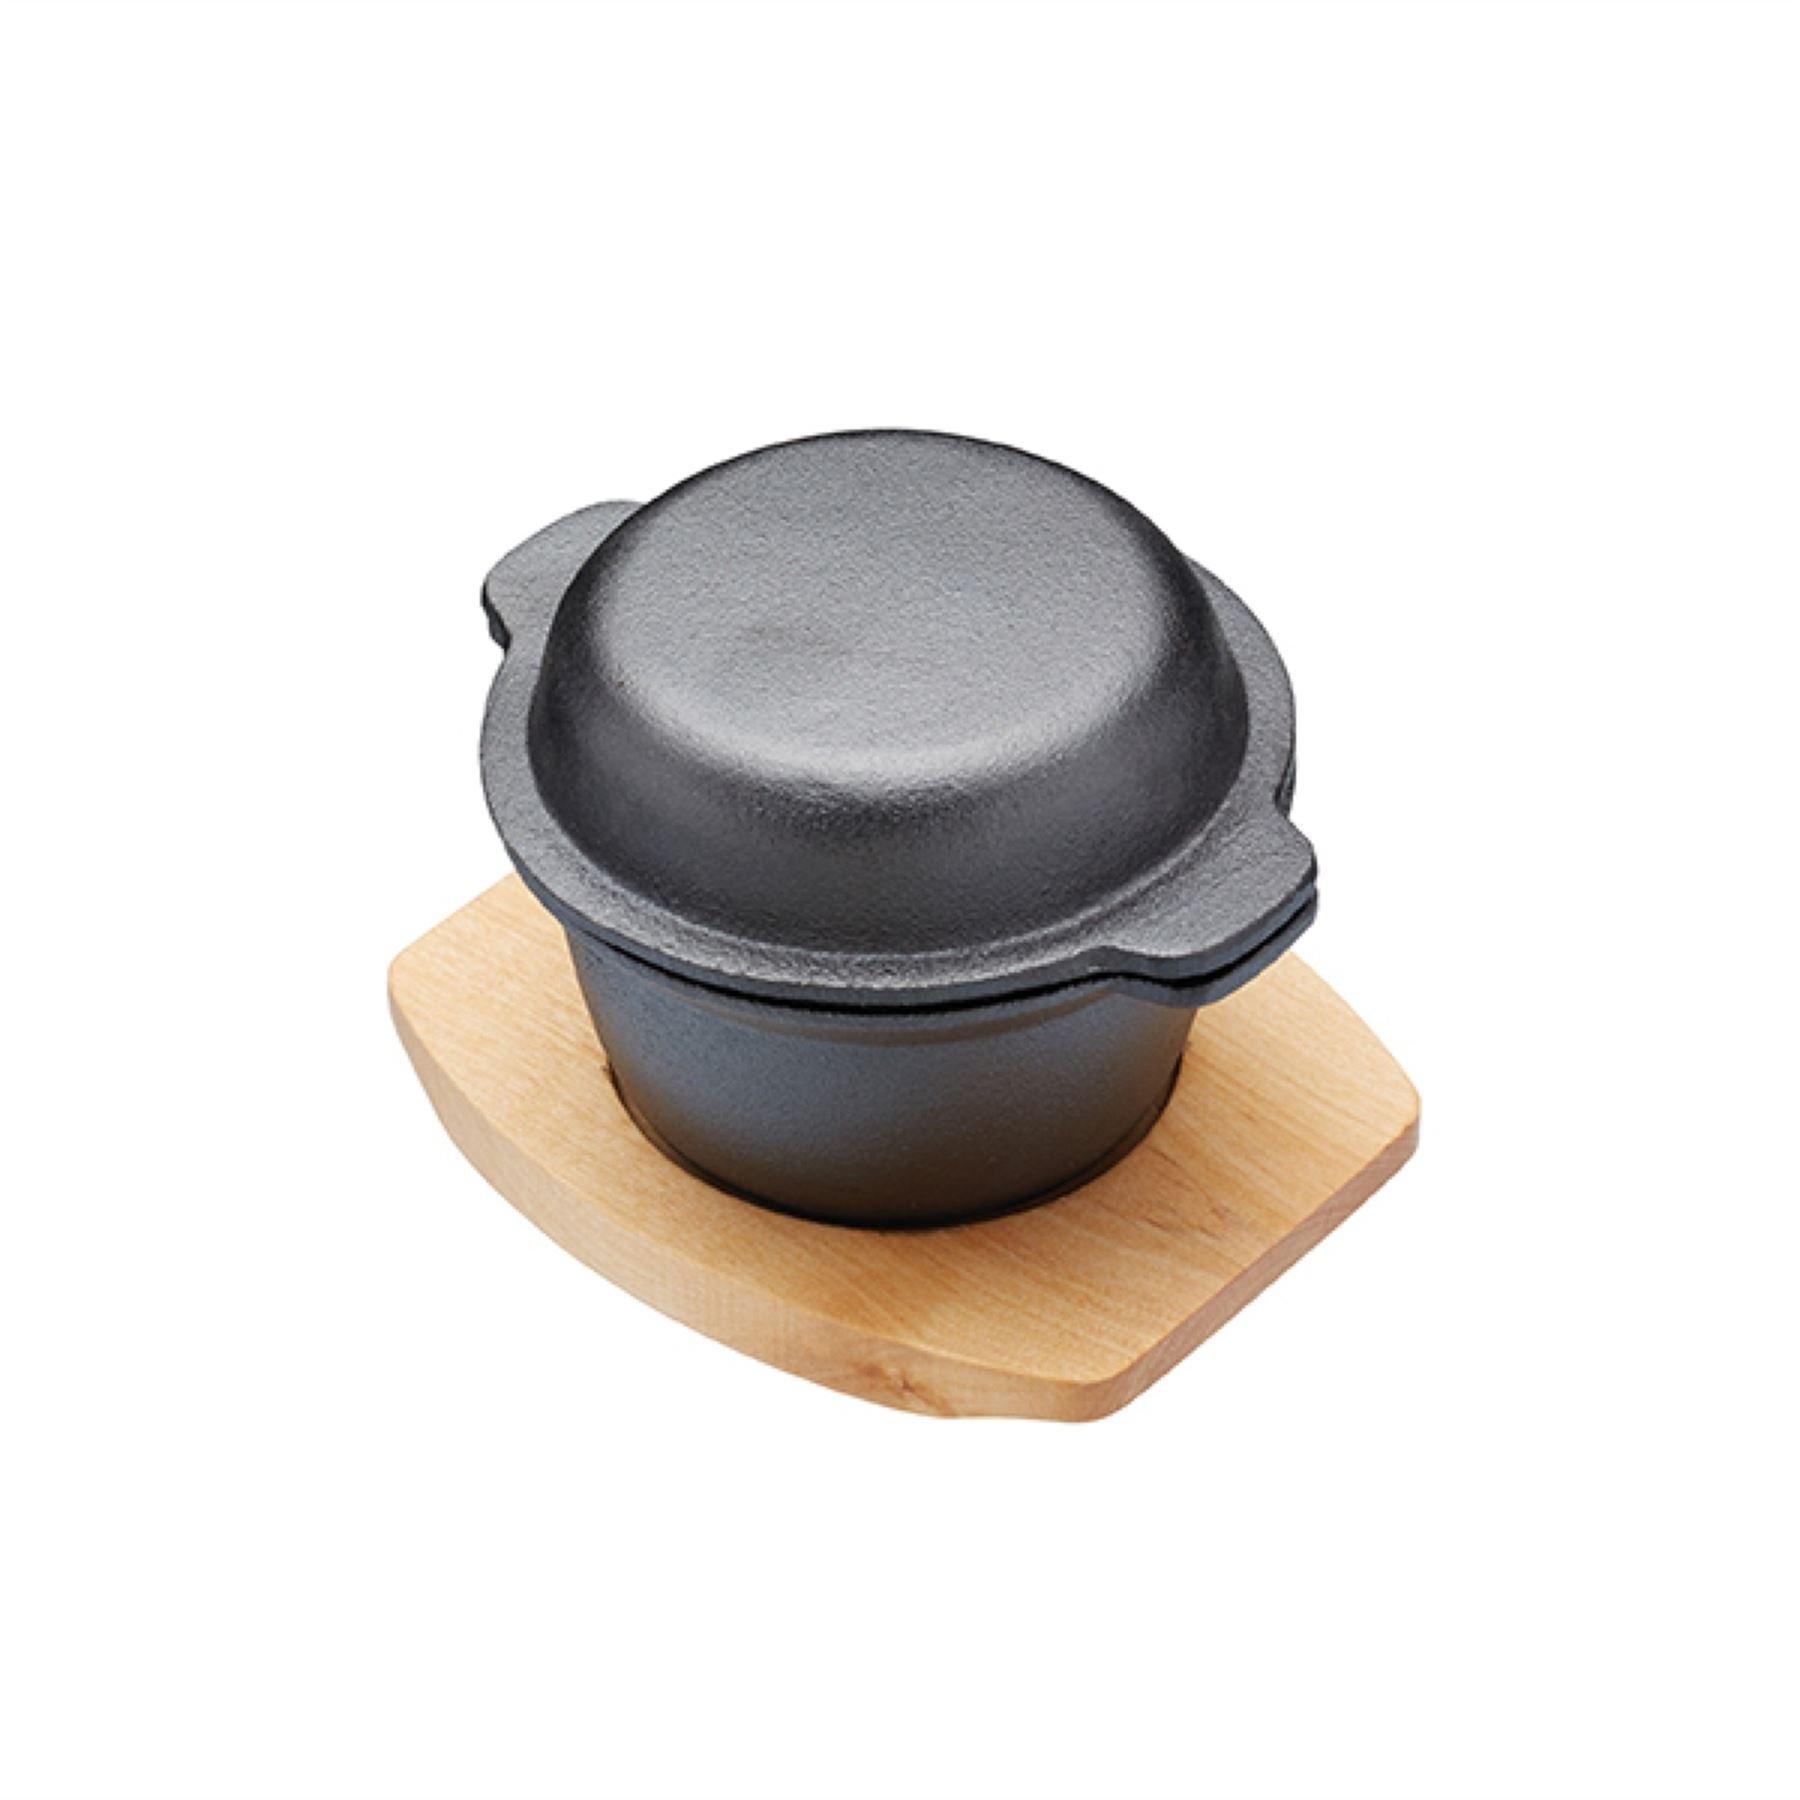 Kitchen Craft Masterclass Artesa Mini Covered Cast Iron Cooking Pot Artgarpot